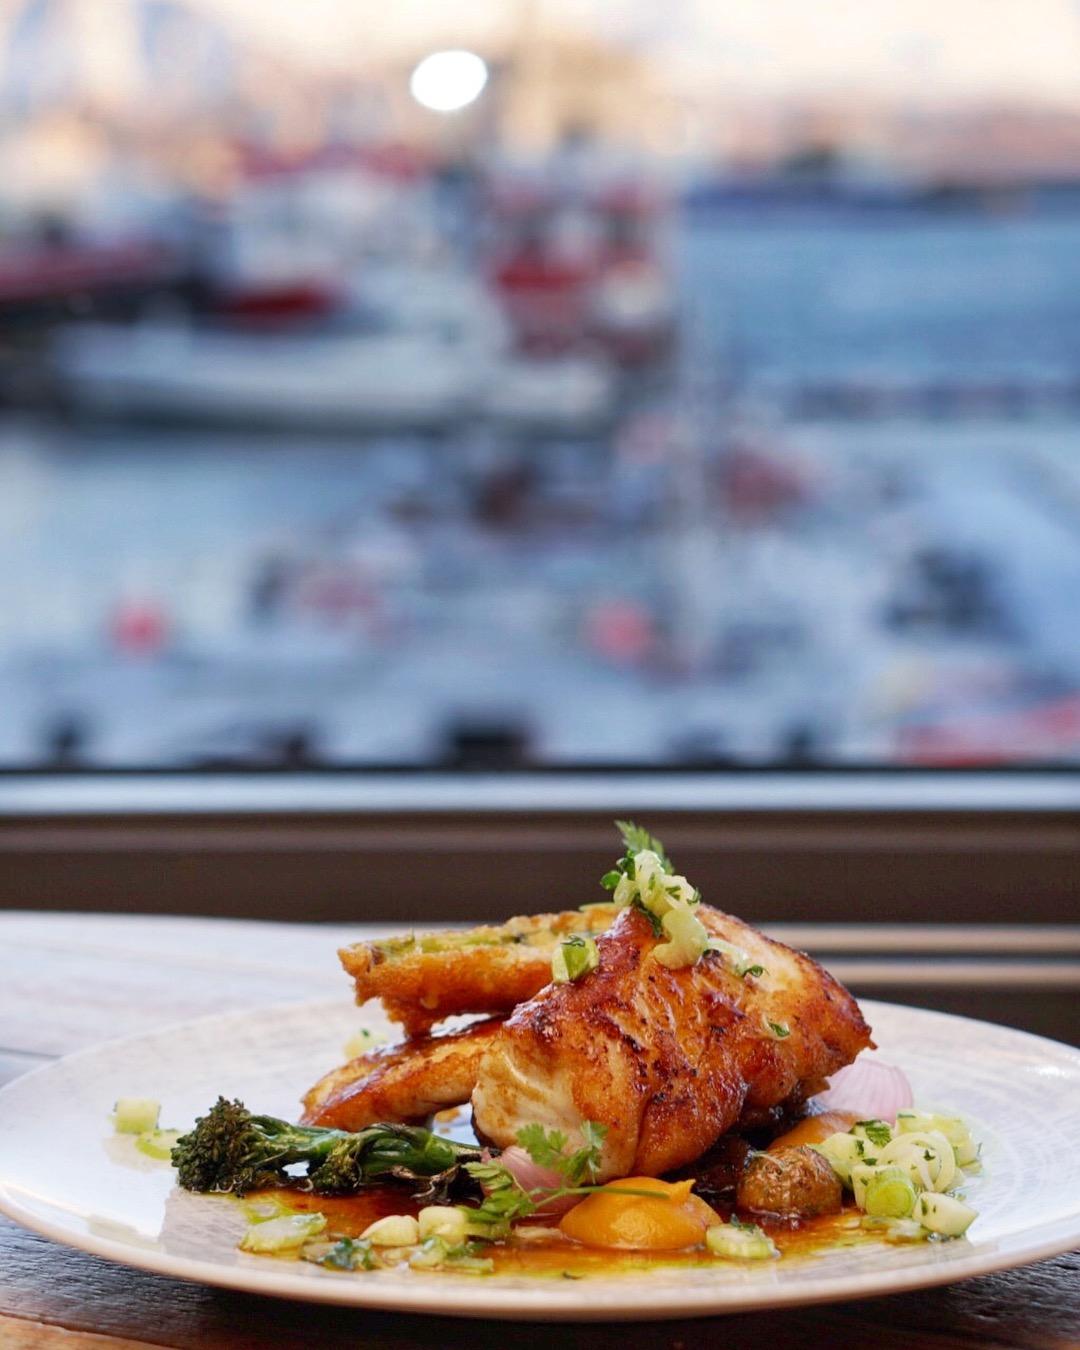 coupleinthekitchen\'s Food Blog With Reviews and Photos